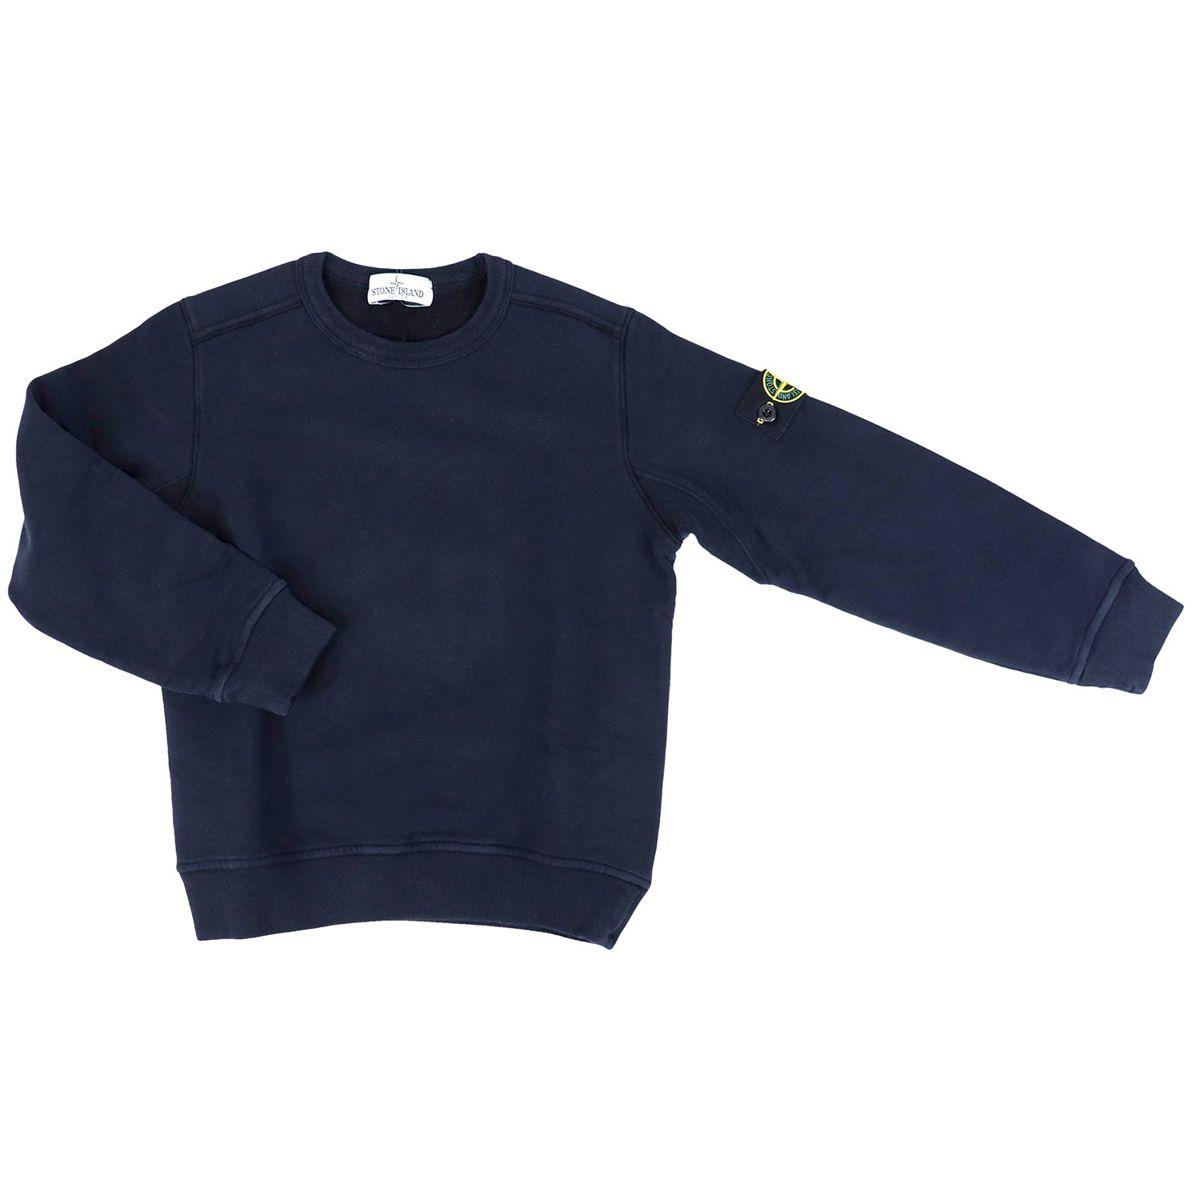 Crewneck cotton sweatshirt Blue STONE ISLAND JUNIOR